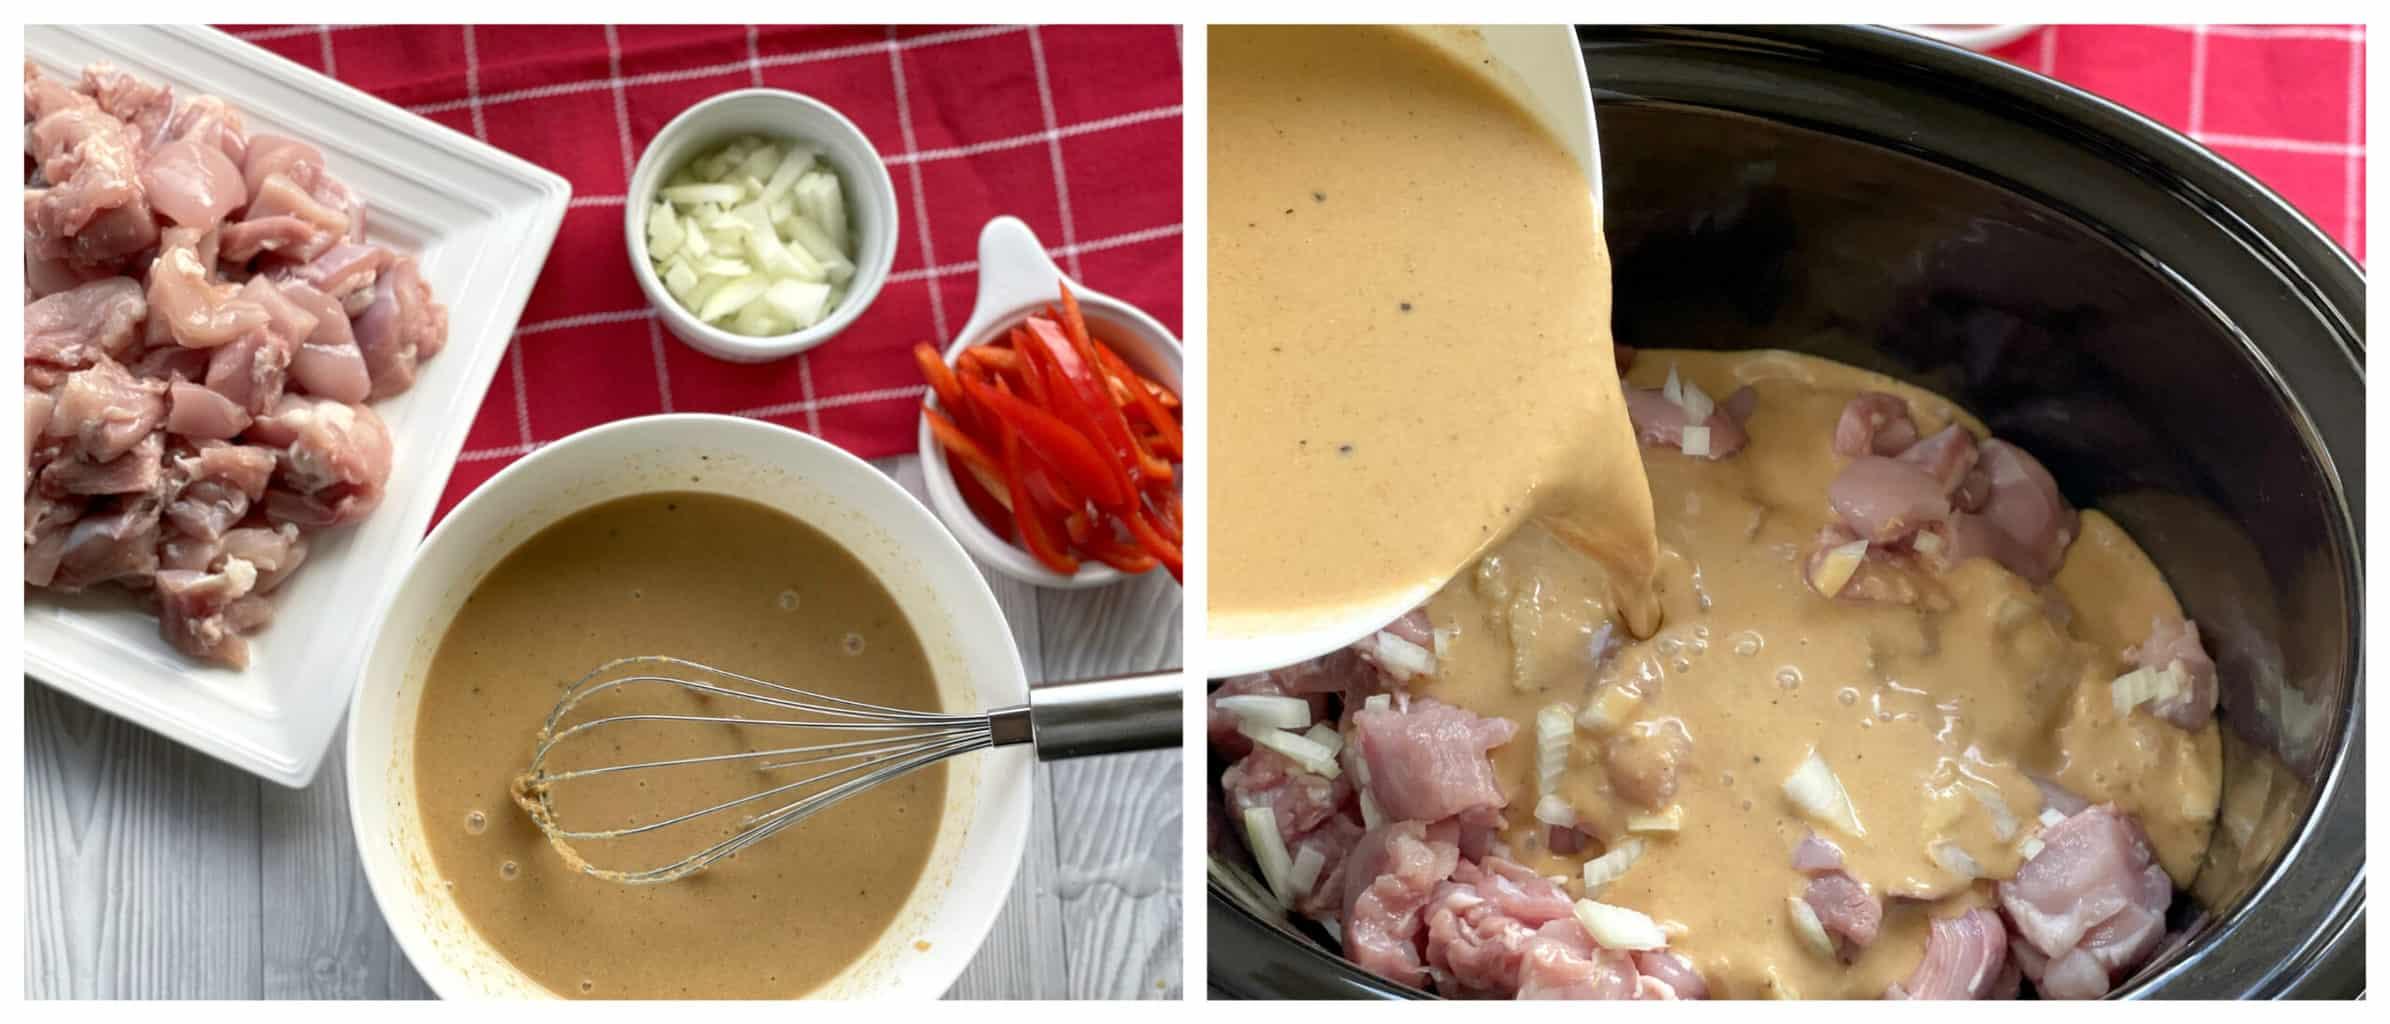 Method for making slow cooker satay chicken